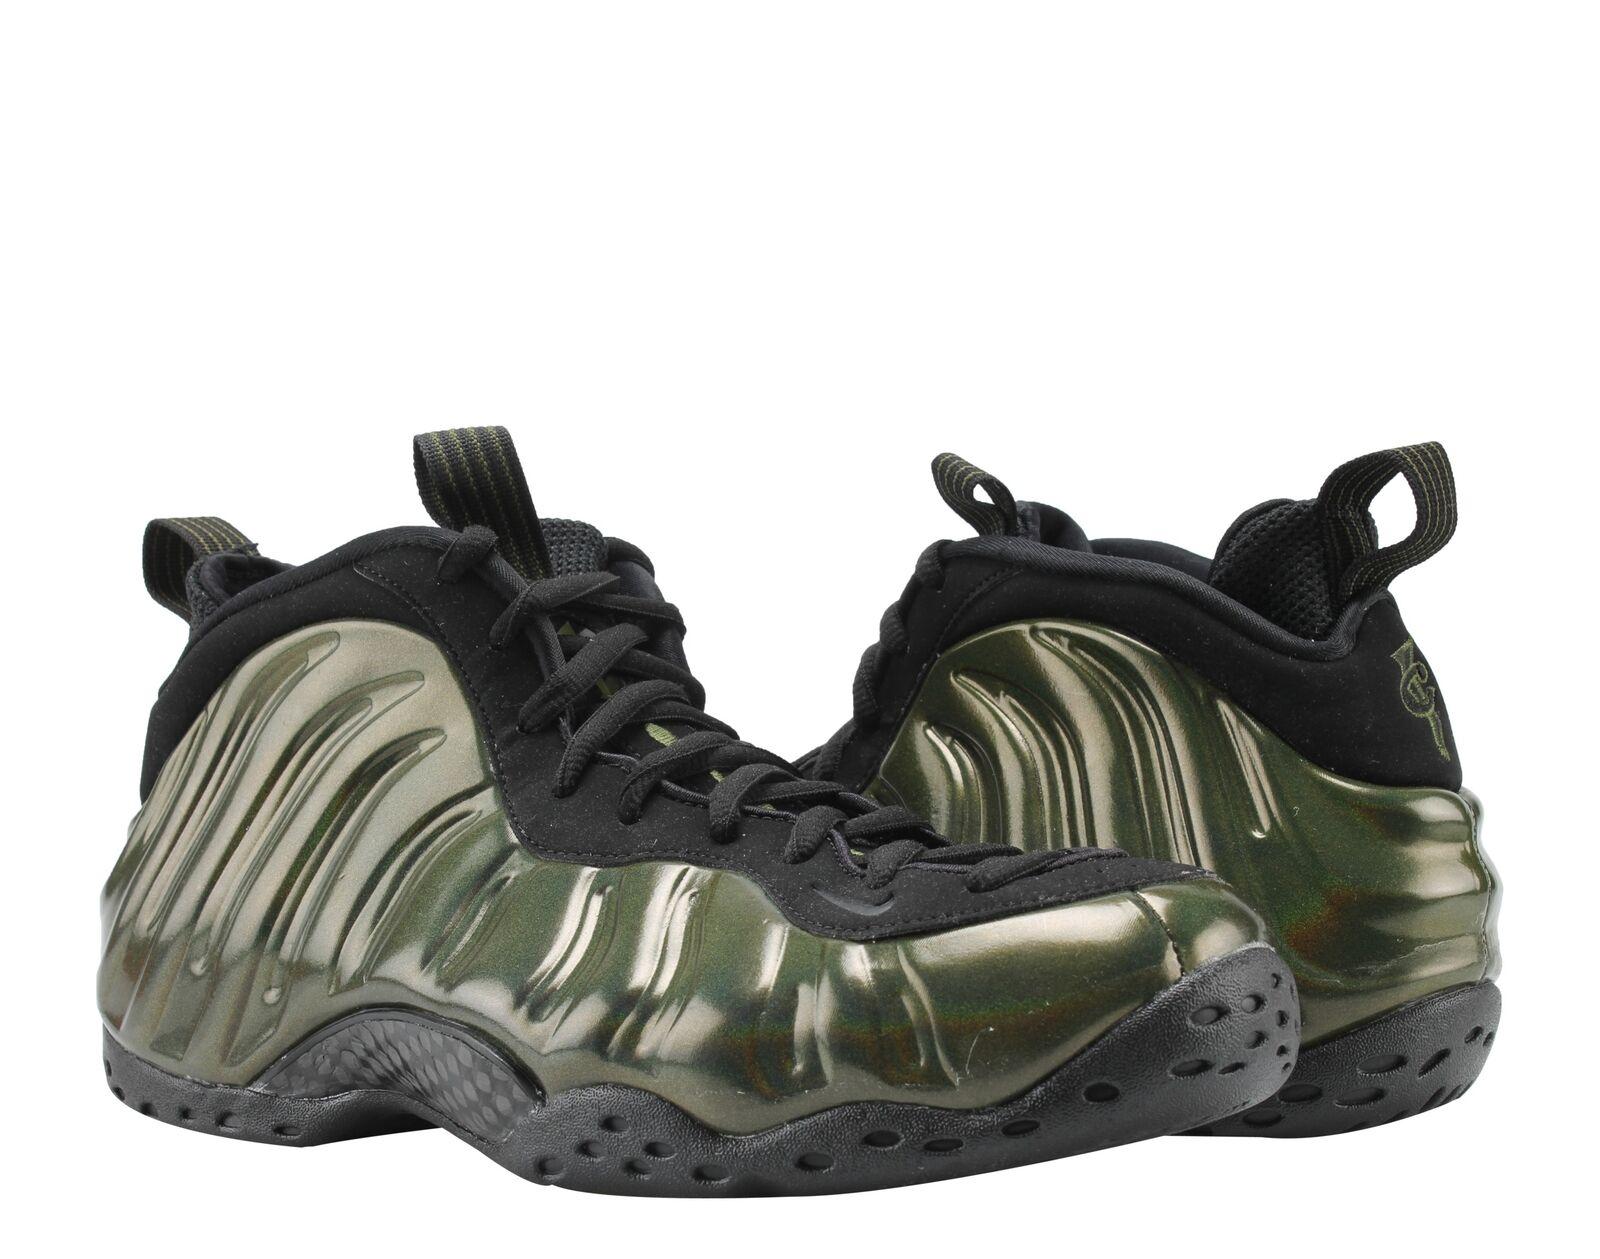 Nike Air Foamposite One Legion Green Black Men's Basketball shoes shoes shoes 314996-301 e8f687